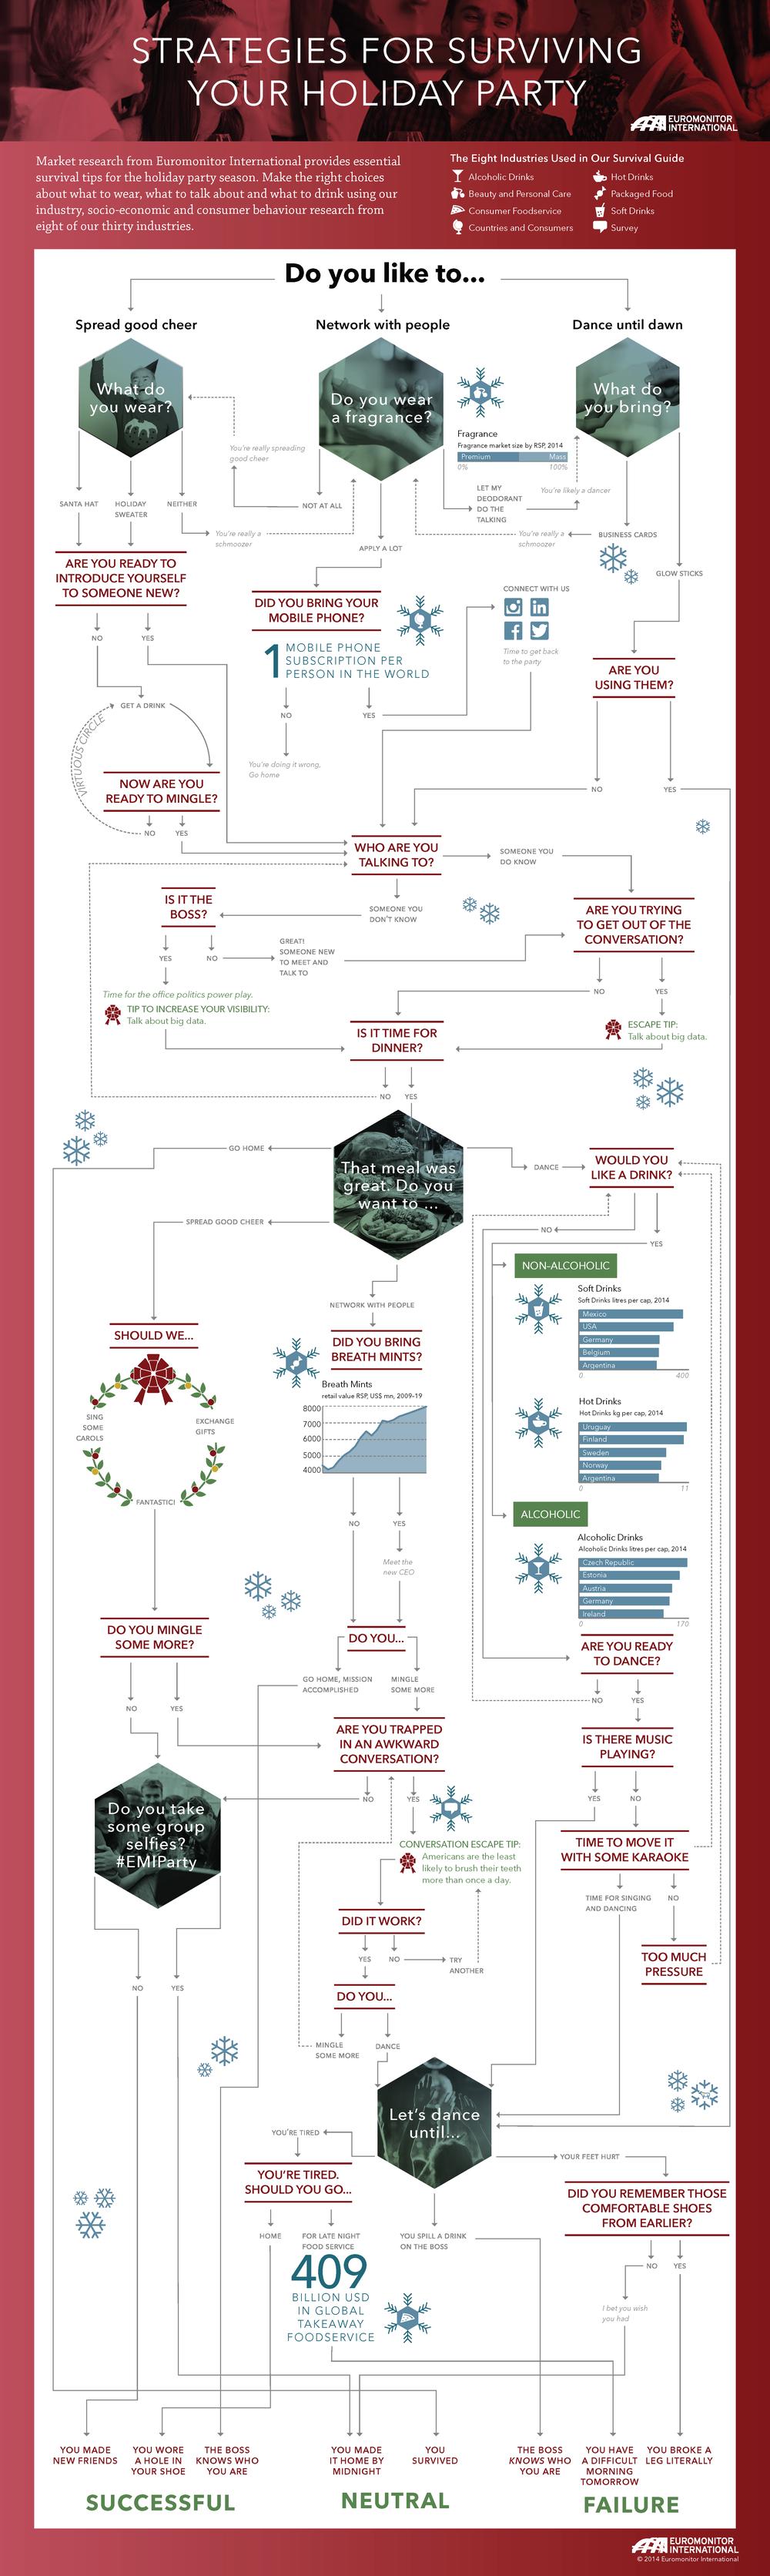 print_holidayCard2014-v1.1.png